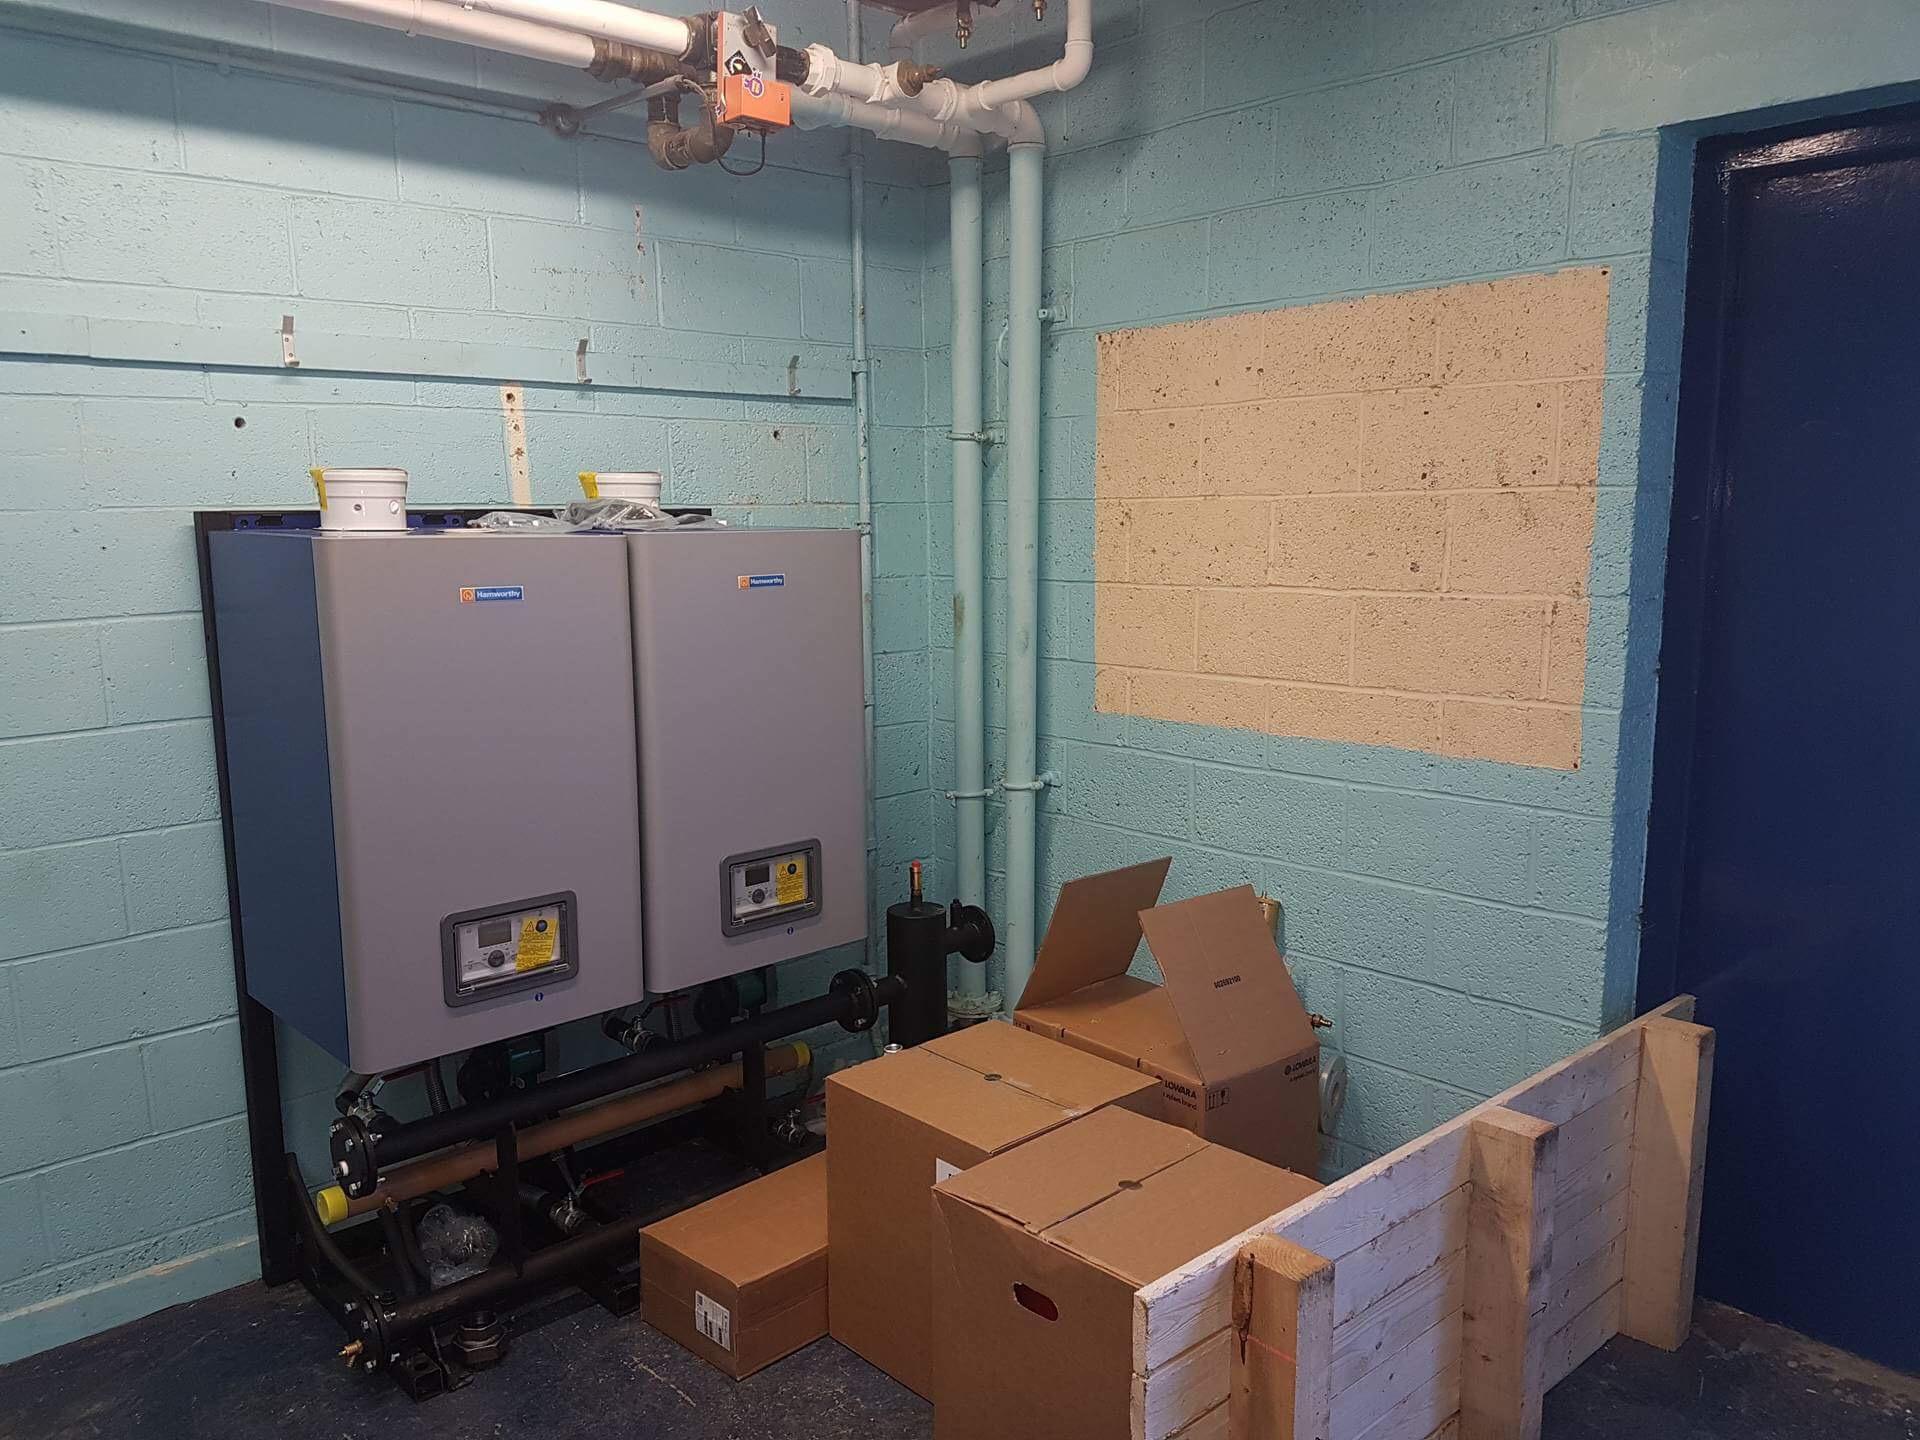 Hamworthy boiler HVAC installation - Service 2 (HVAC) Limited